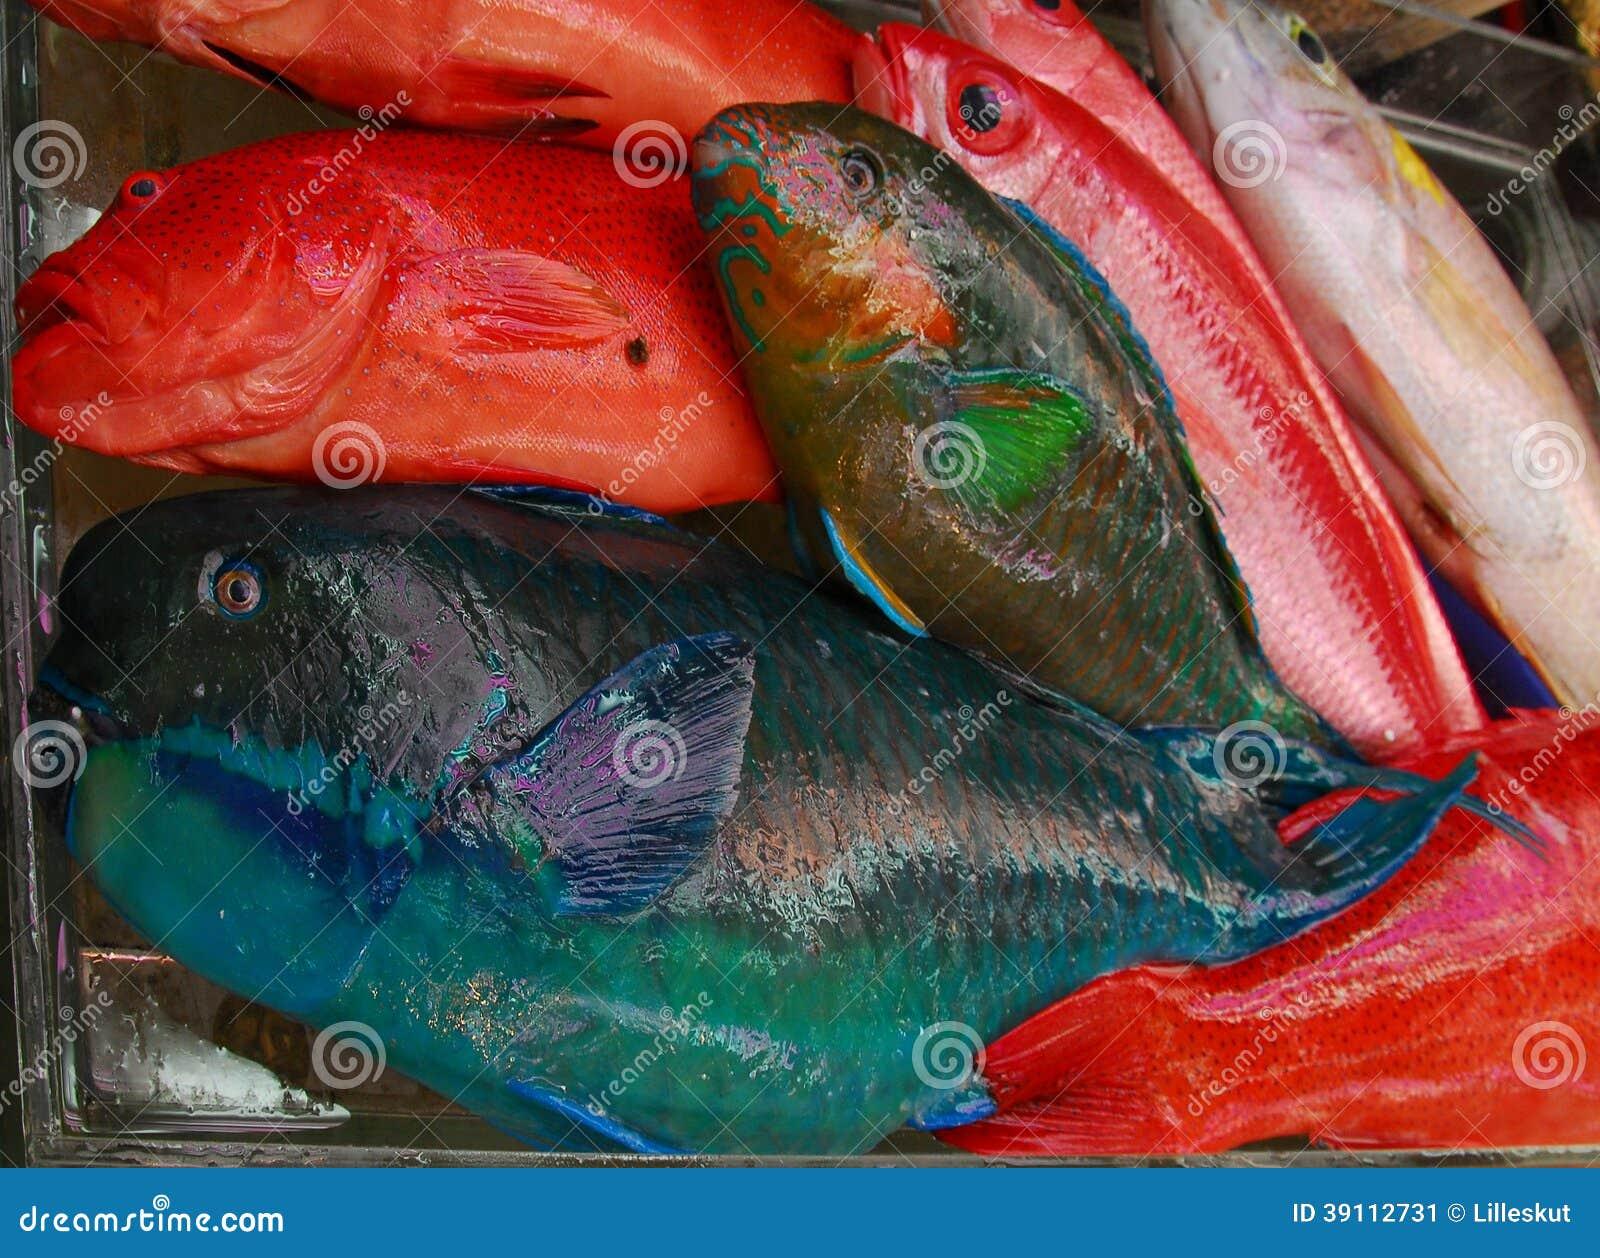 Colorful fish at market stock image. Image of eyes, asia - 39112731